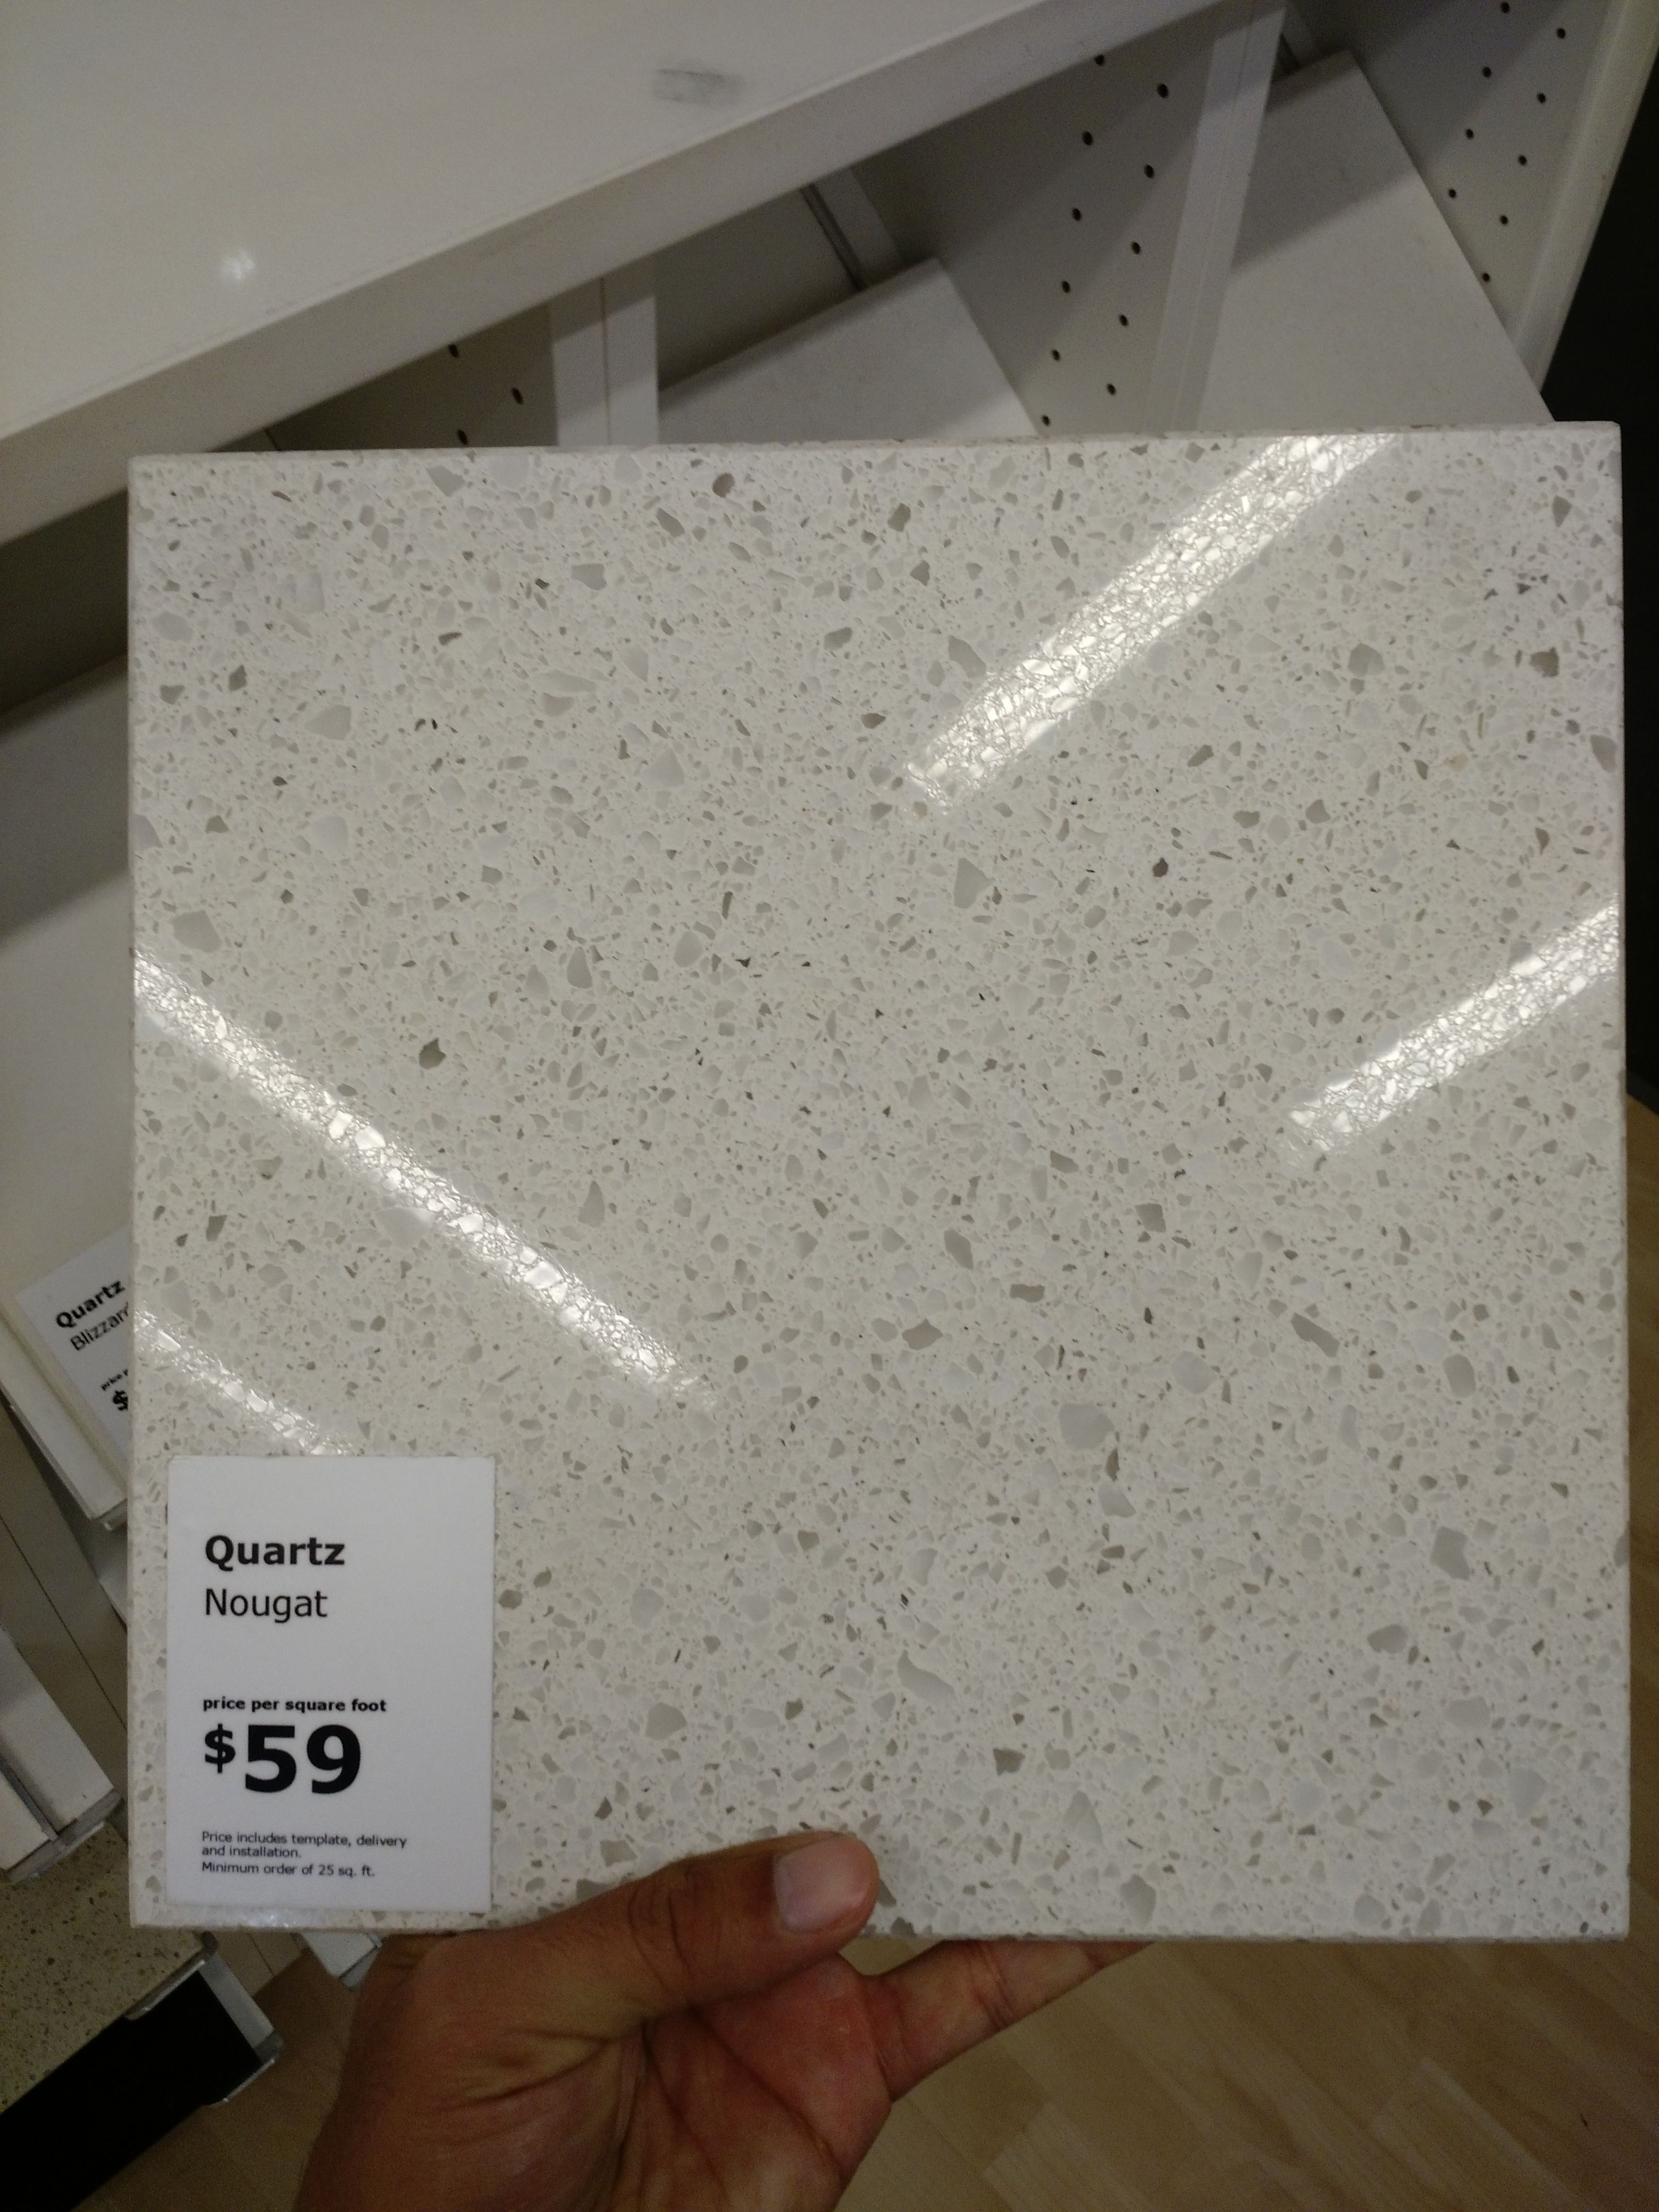 Mobile Home Kitchen Remodel Countertops Cost Per Square Foot Ikea Quartz Countertop   Pinterest ...